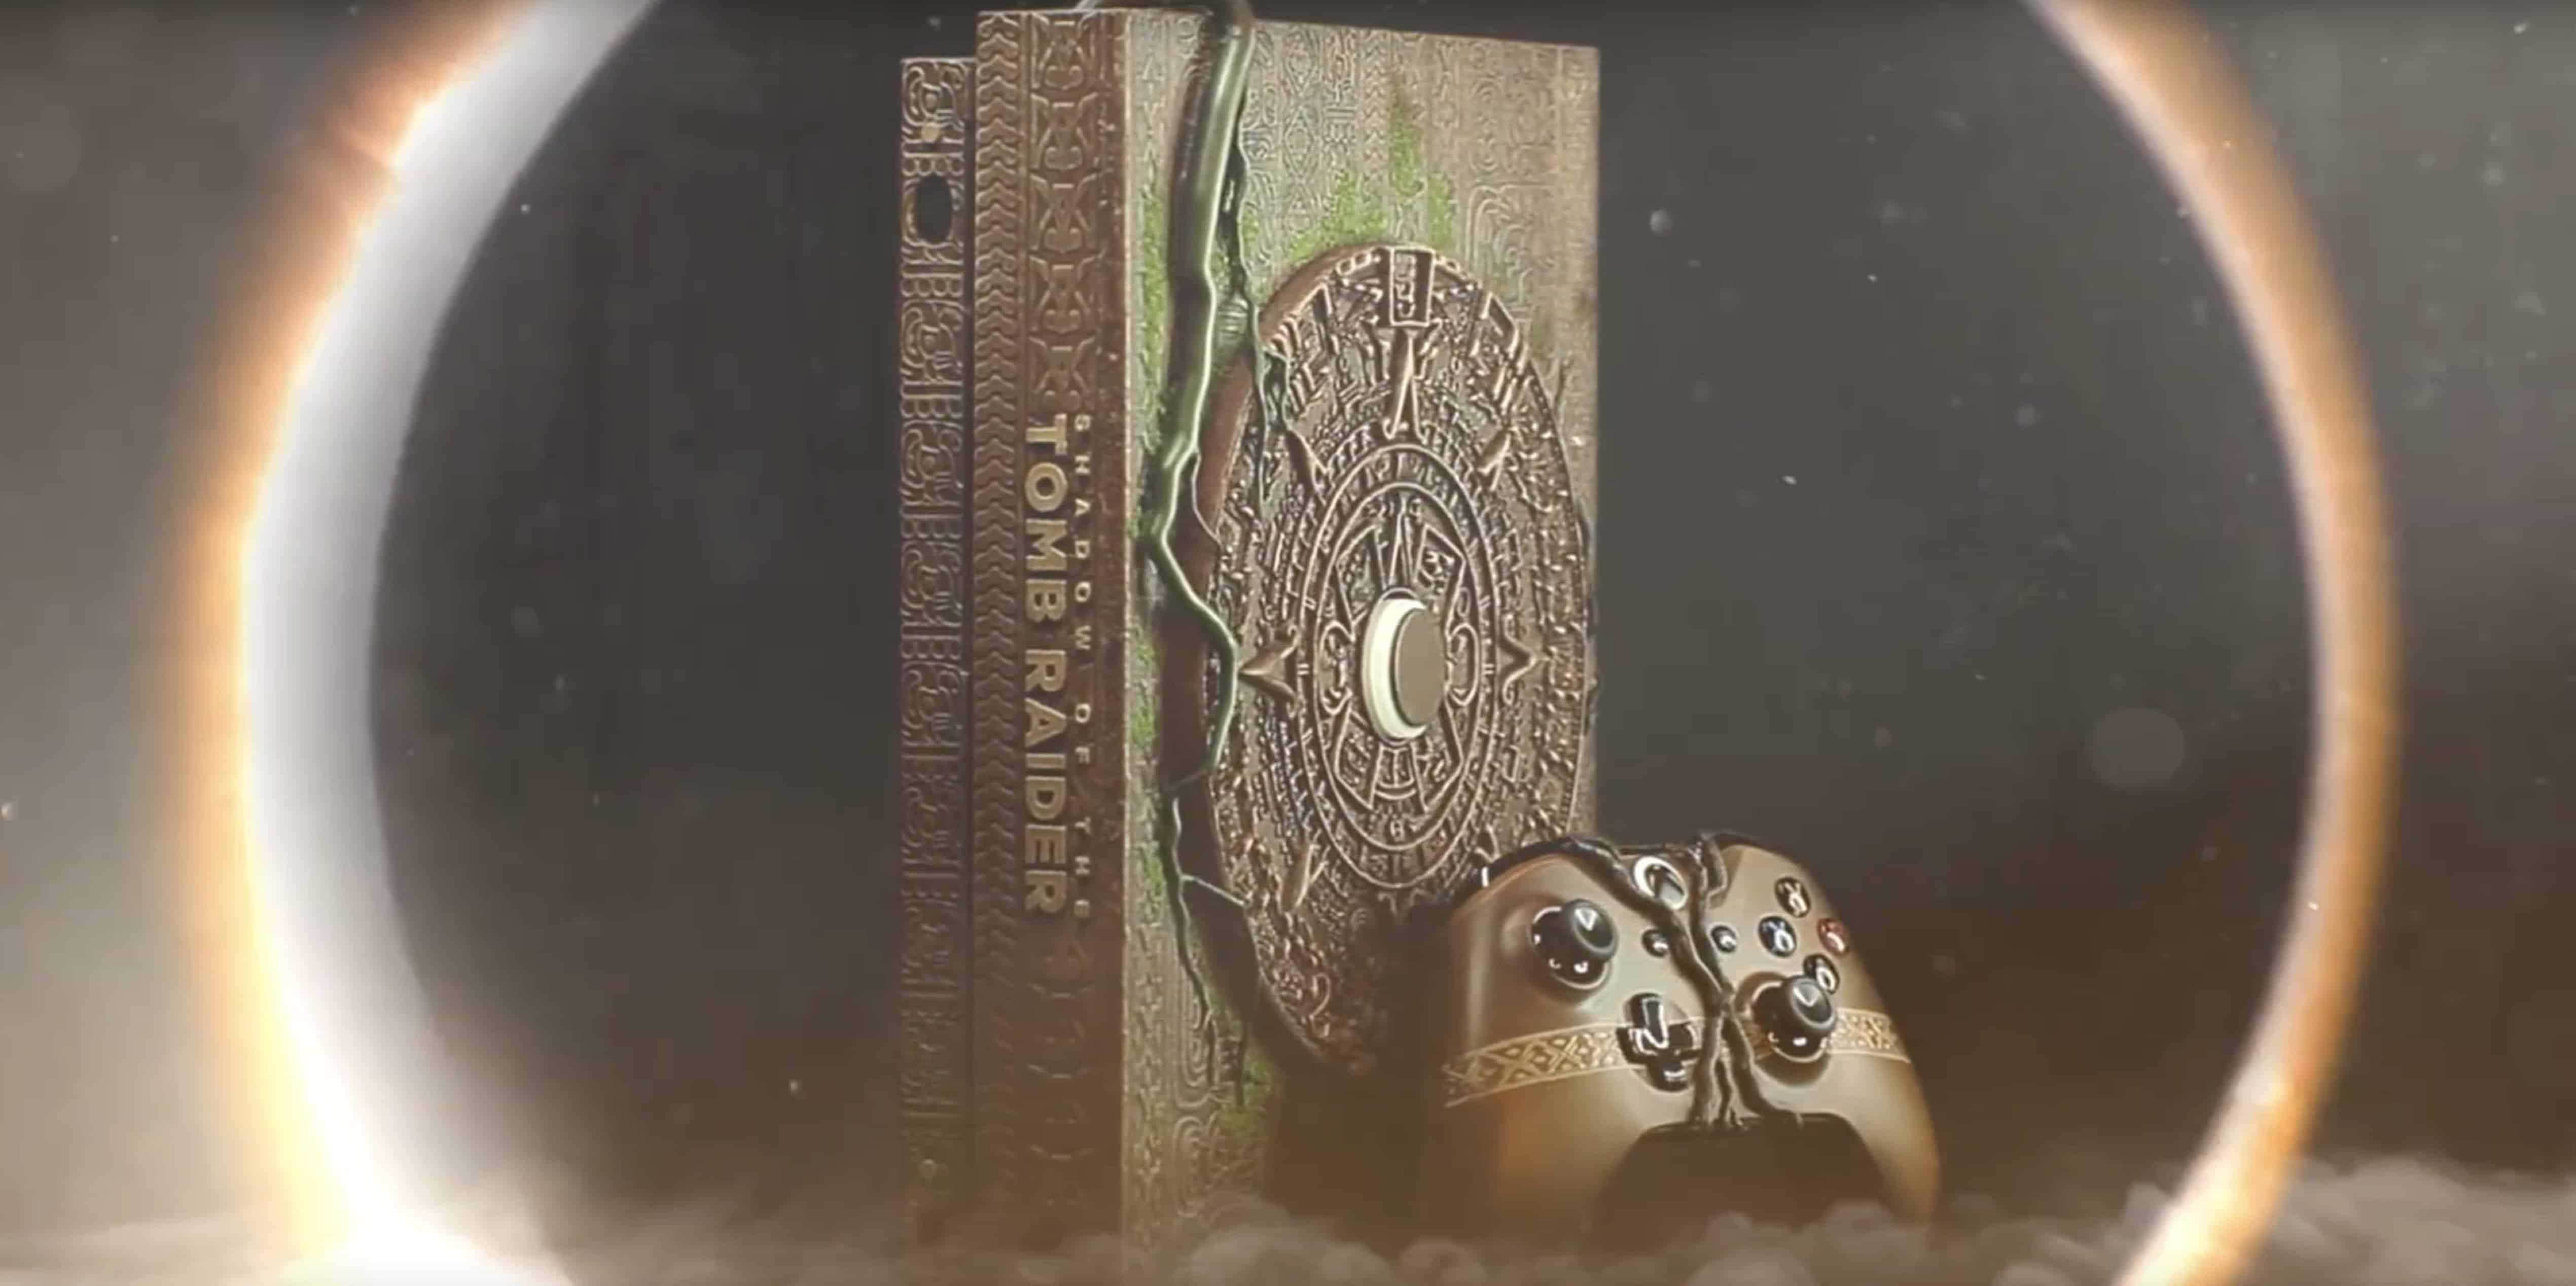 tomb raider definitive edition xbox one x